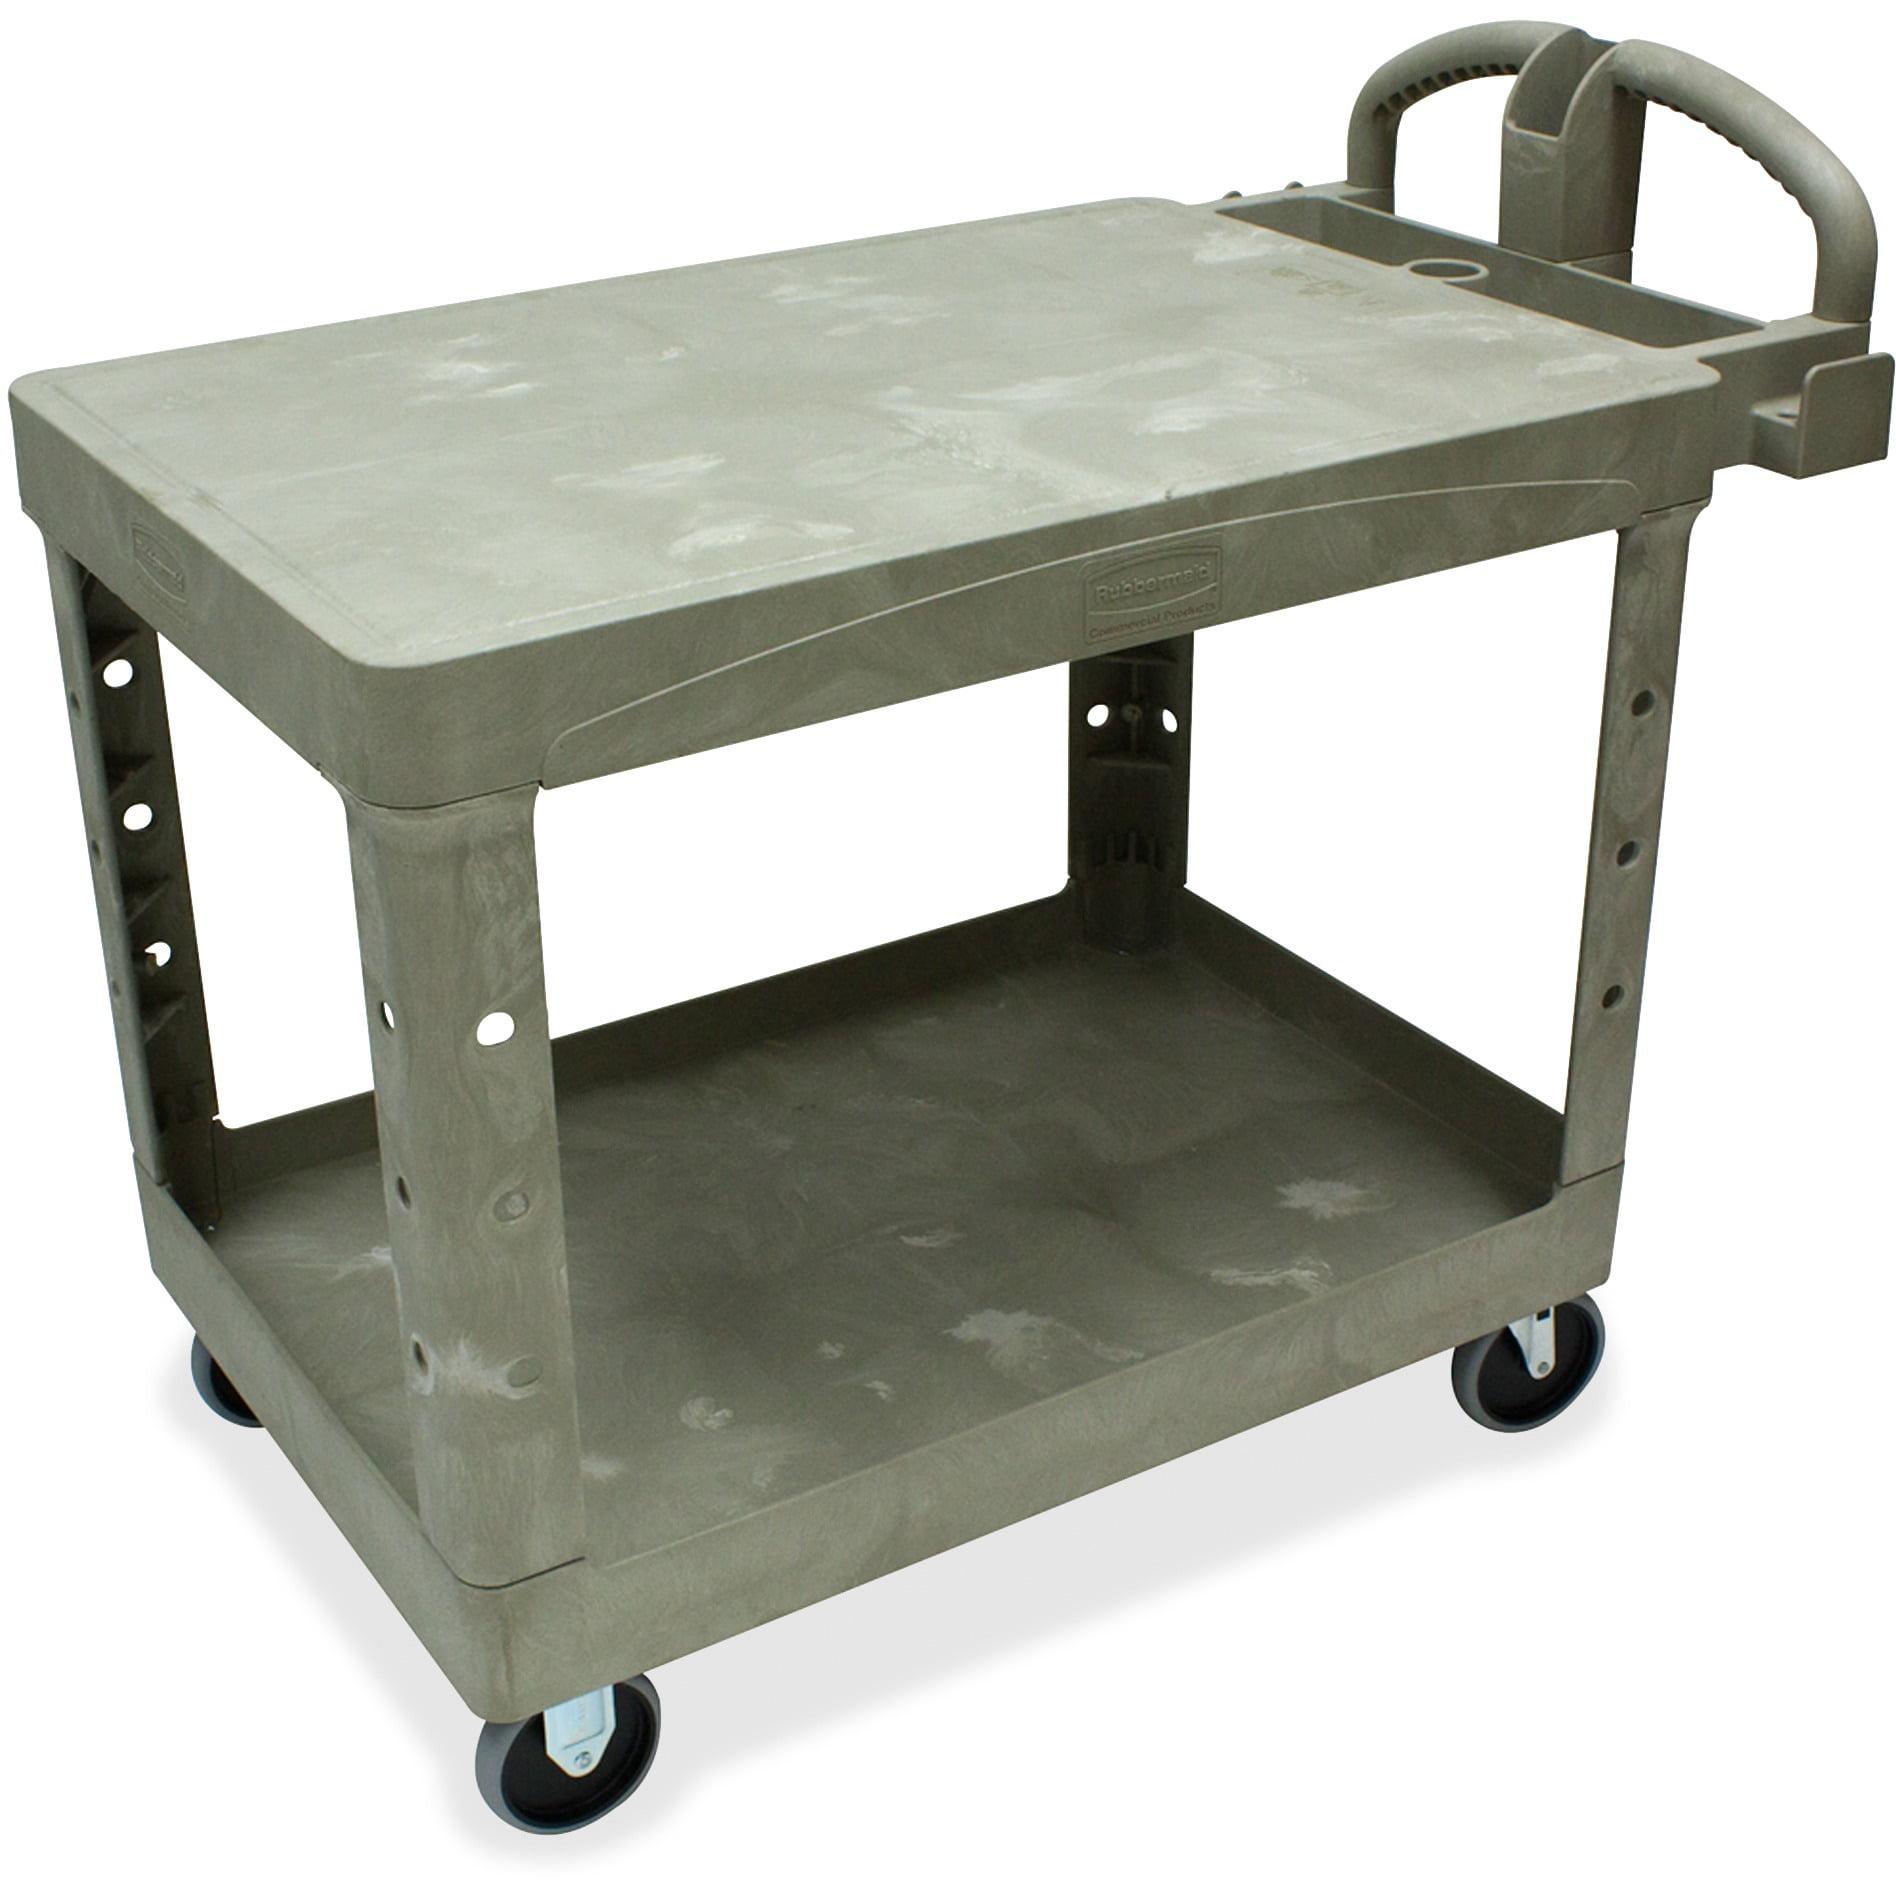 "Rubbermaid Commercial, RCP452500BG, 26"" Flat Shelf Utility Cart, 1 Each, Beige"